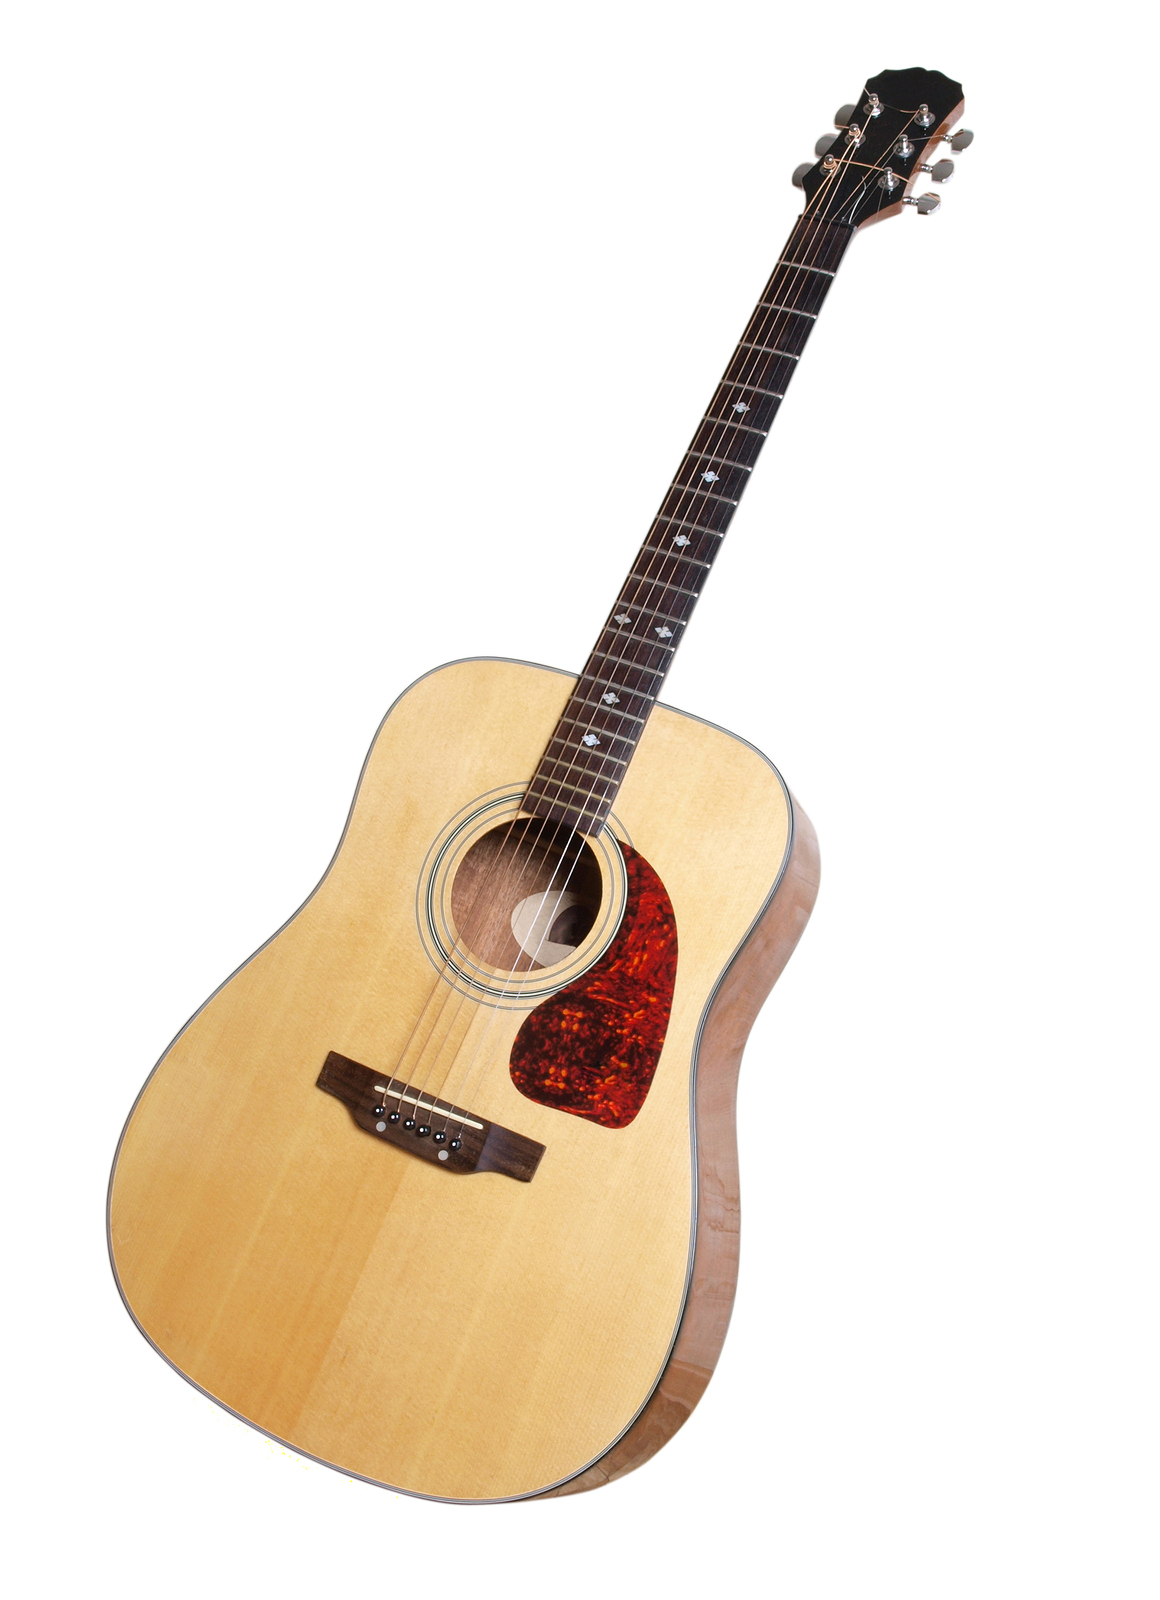 Acoustic Guitar Image : what kind of guitar should a beginner get should i rent or buy ~ Russianpoet.info Haus und Dekorationen